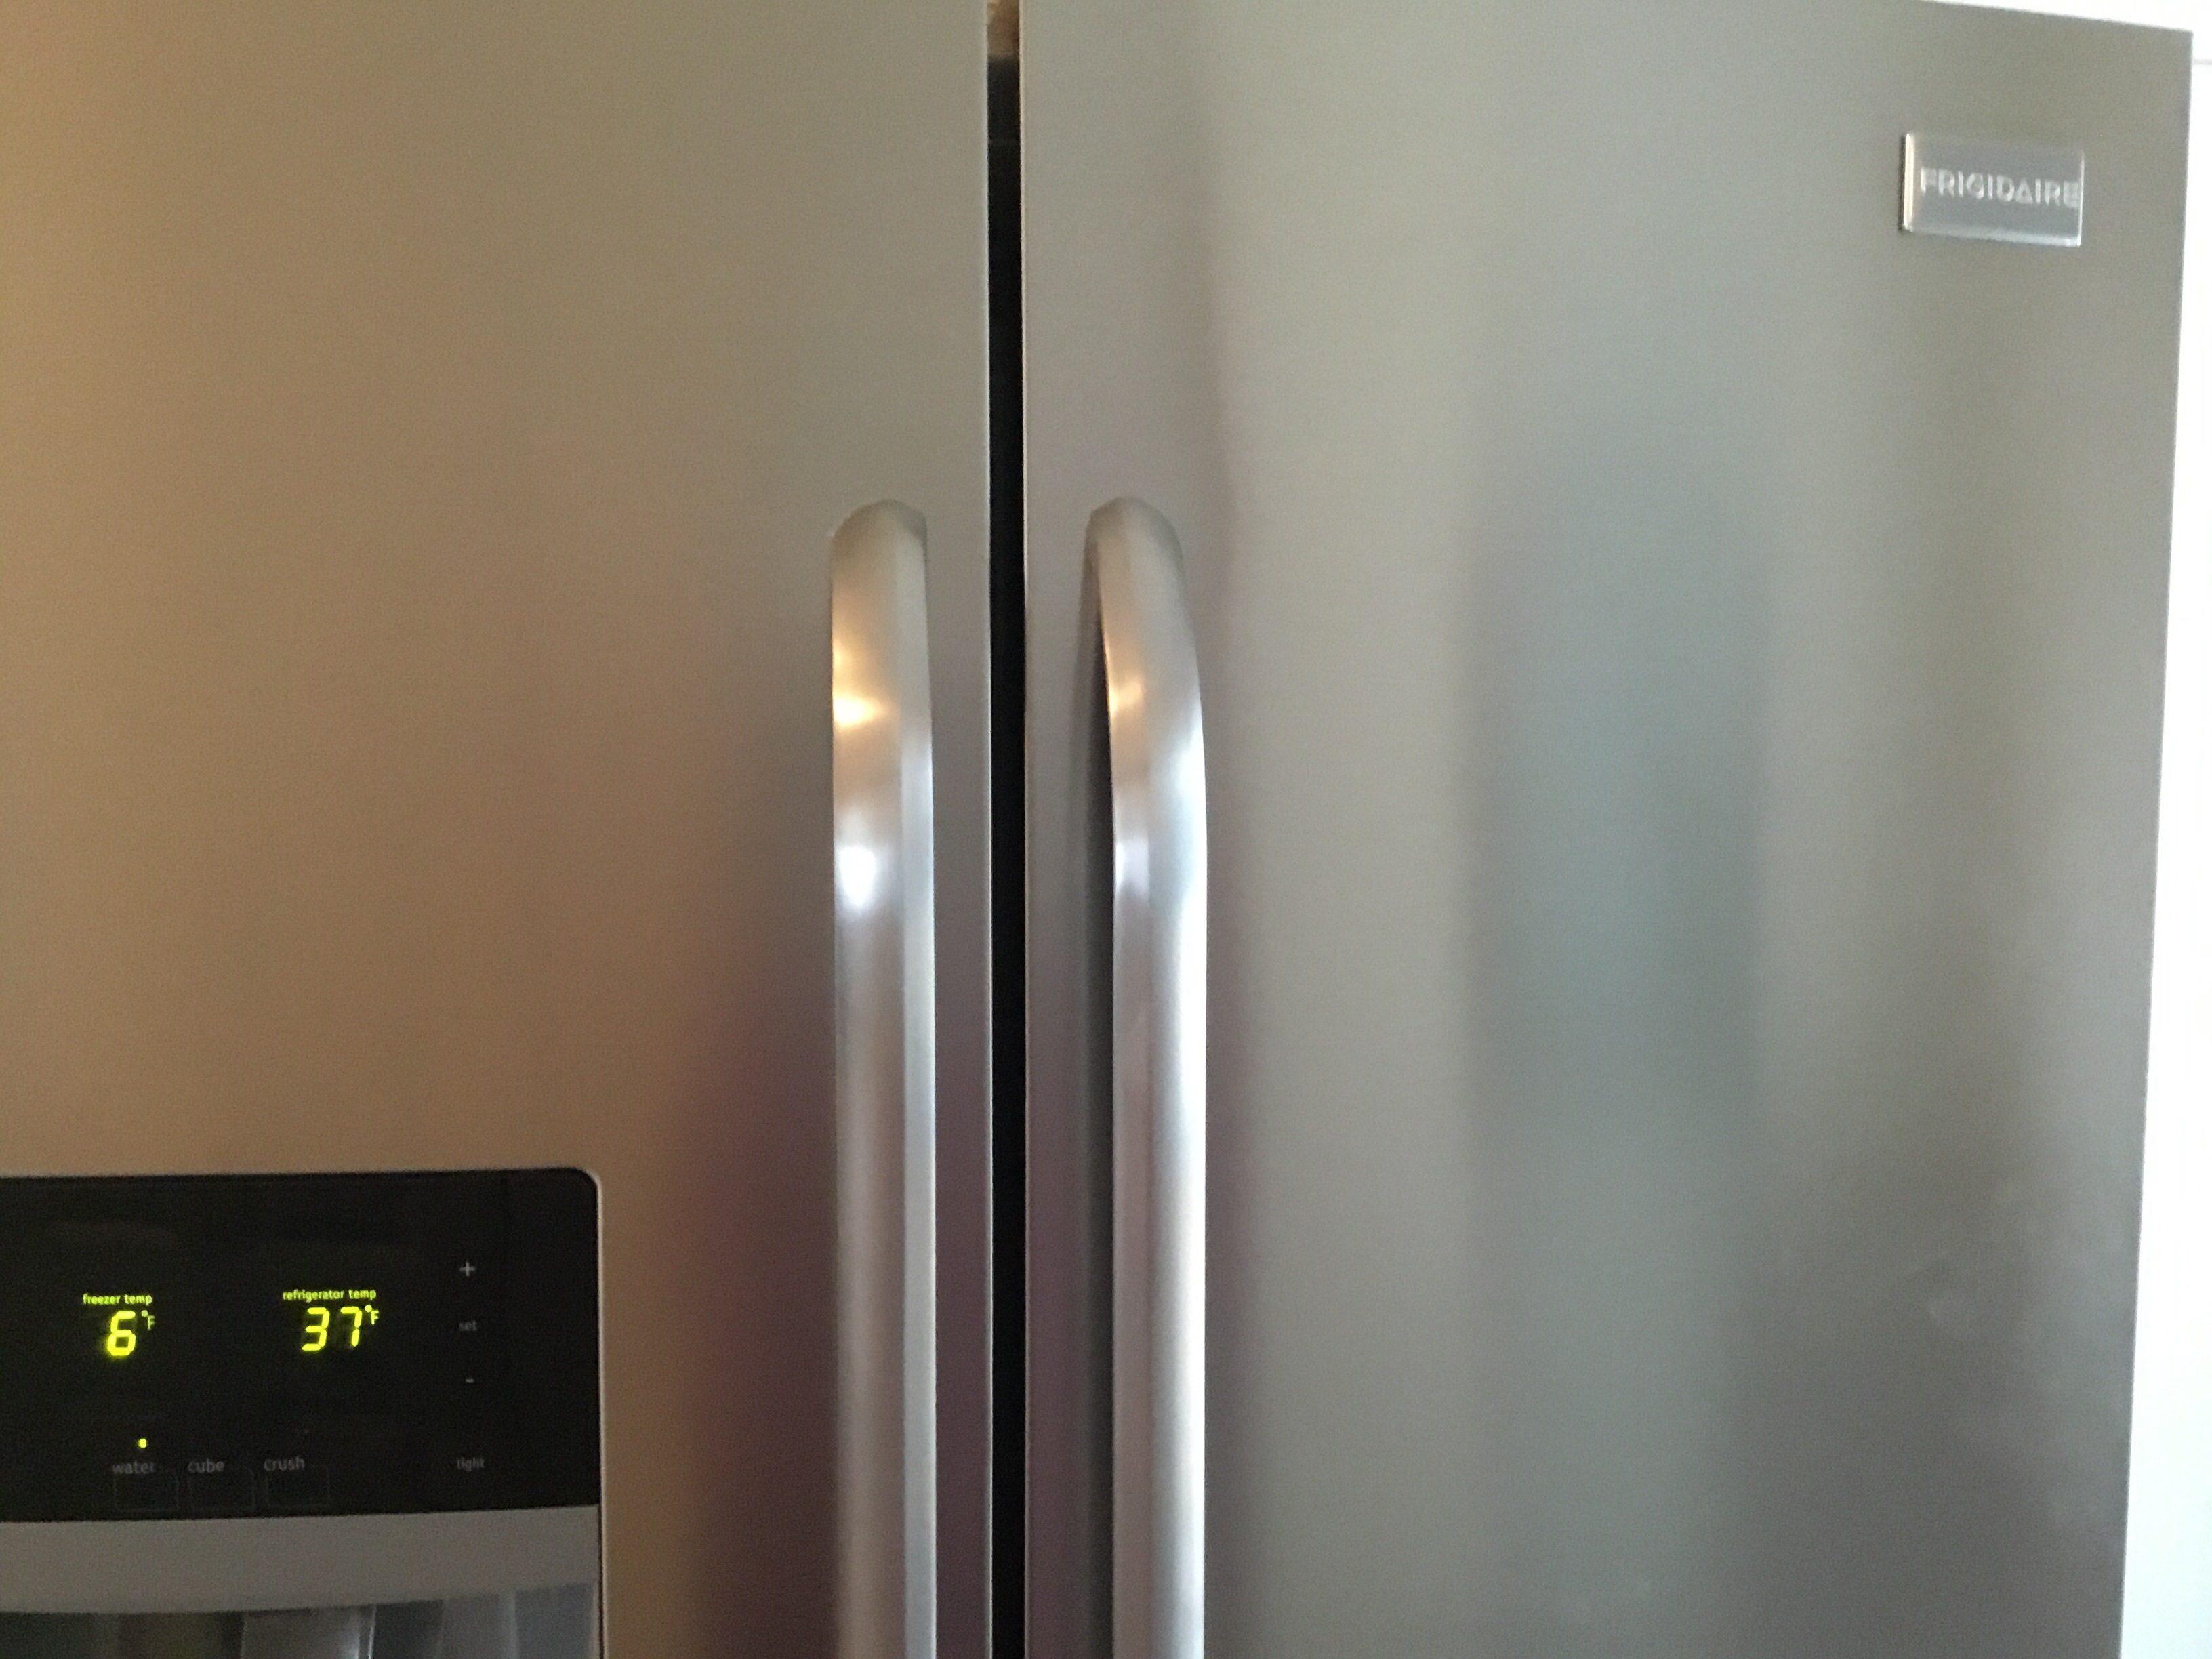 Top 811 Complaints And Reviews About Frigidaire Refrigerators